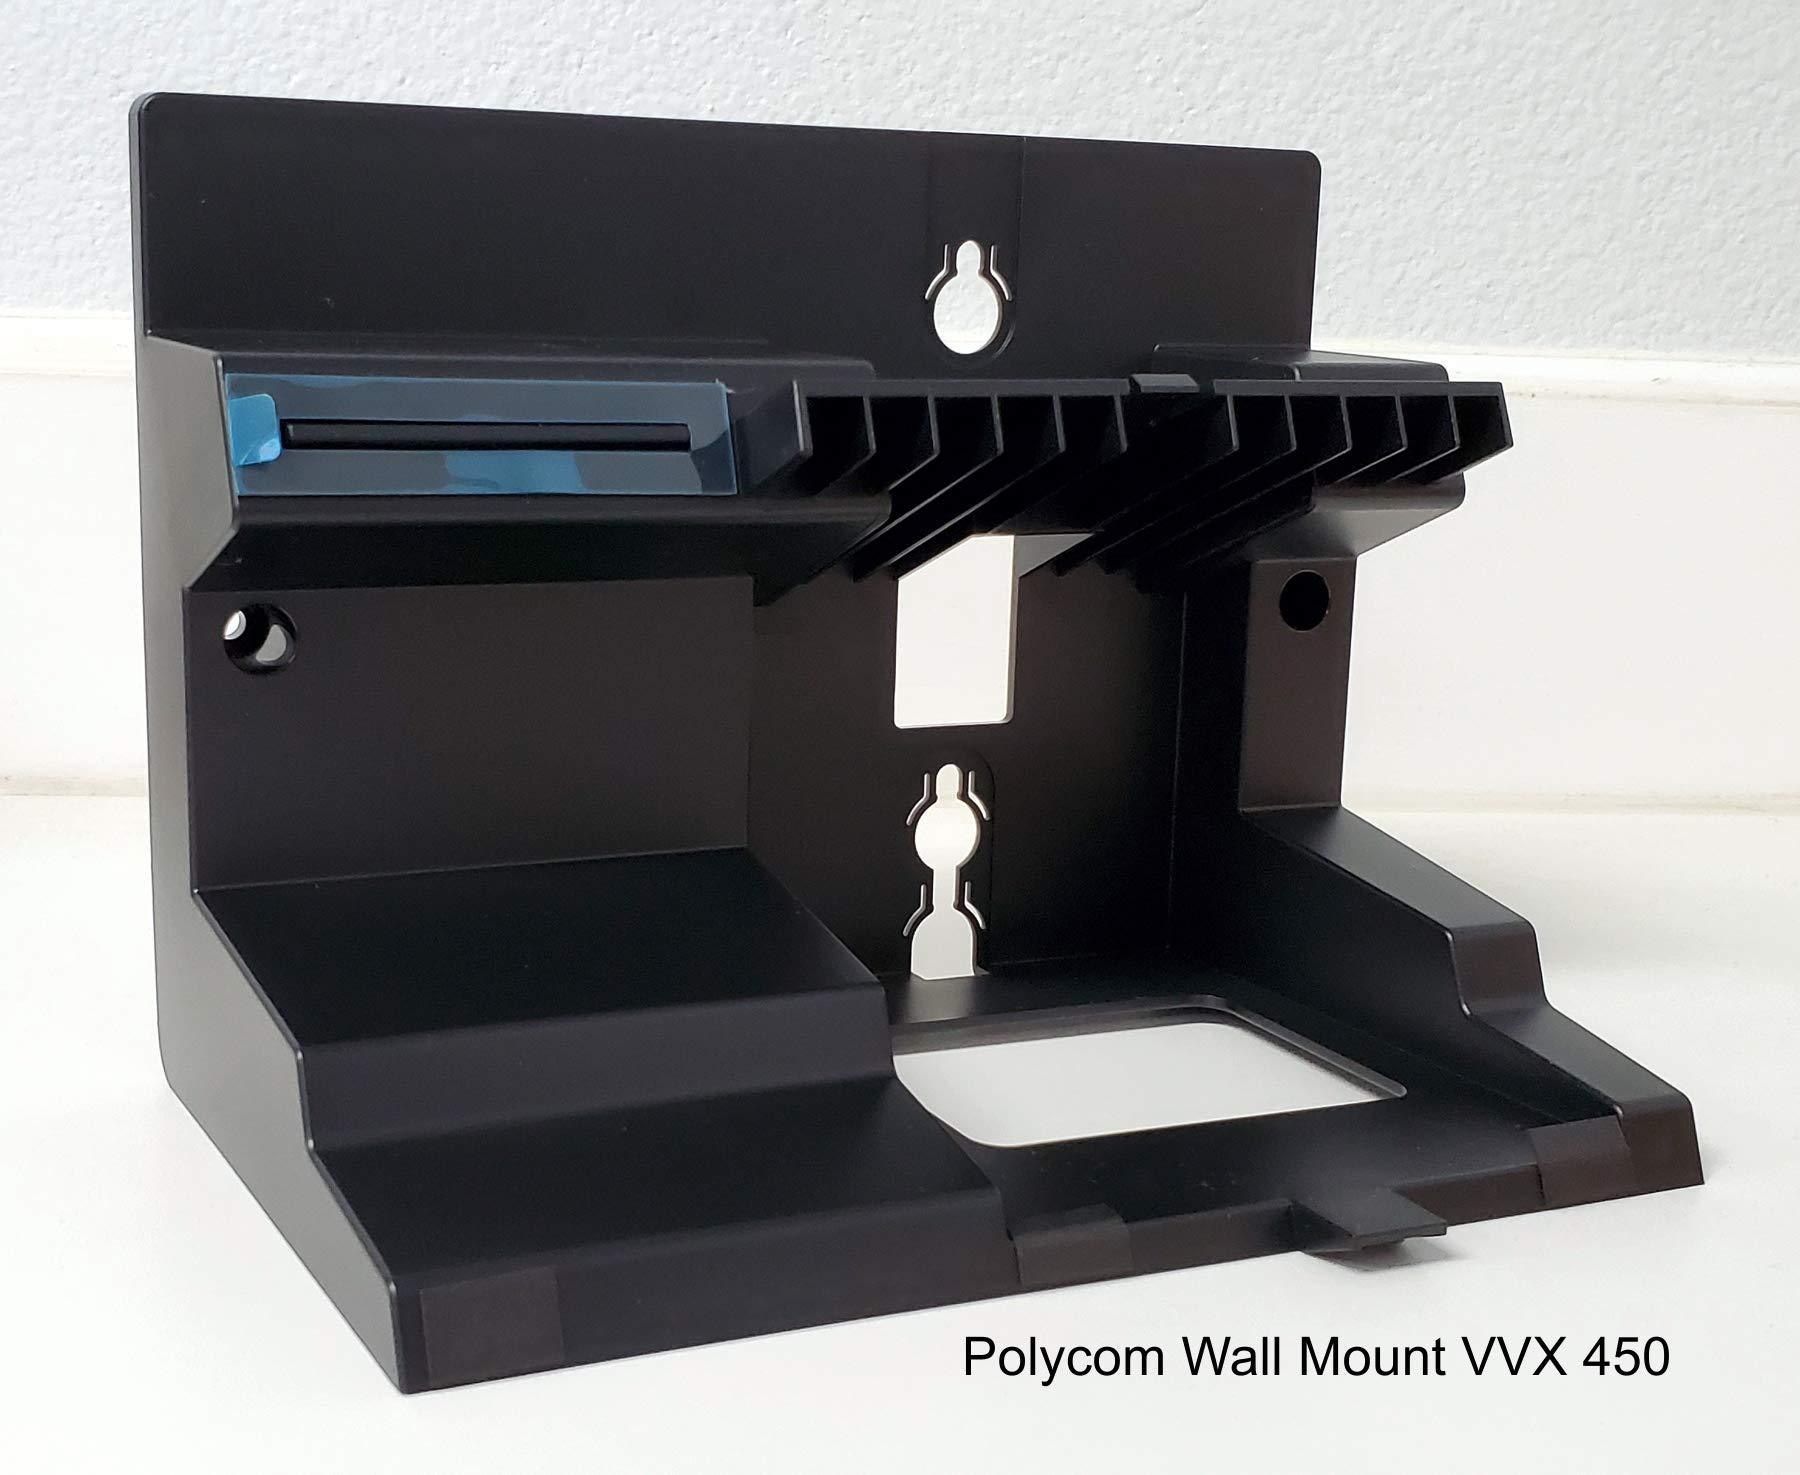 Polycom 2200-48843-001 Wall Mount Bracket for VVX 450 Phones by Polycom